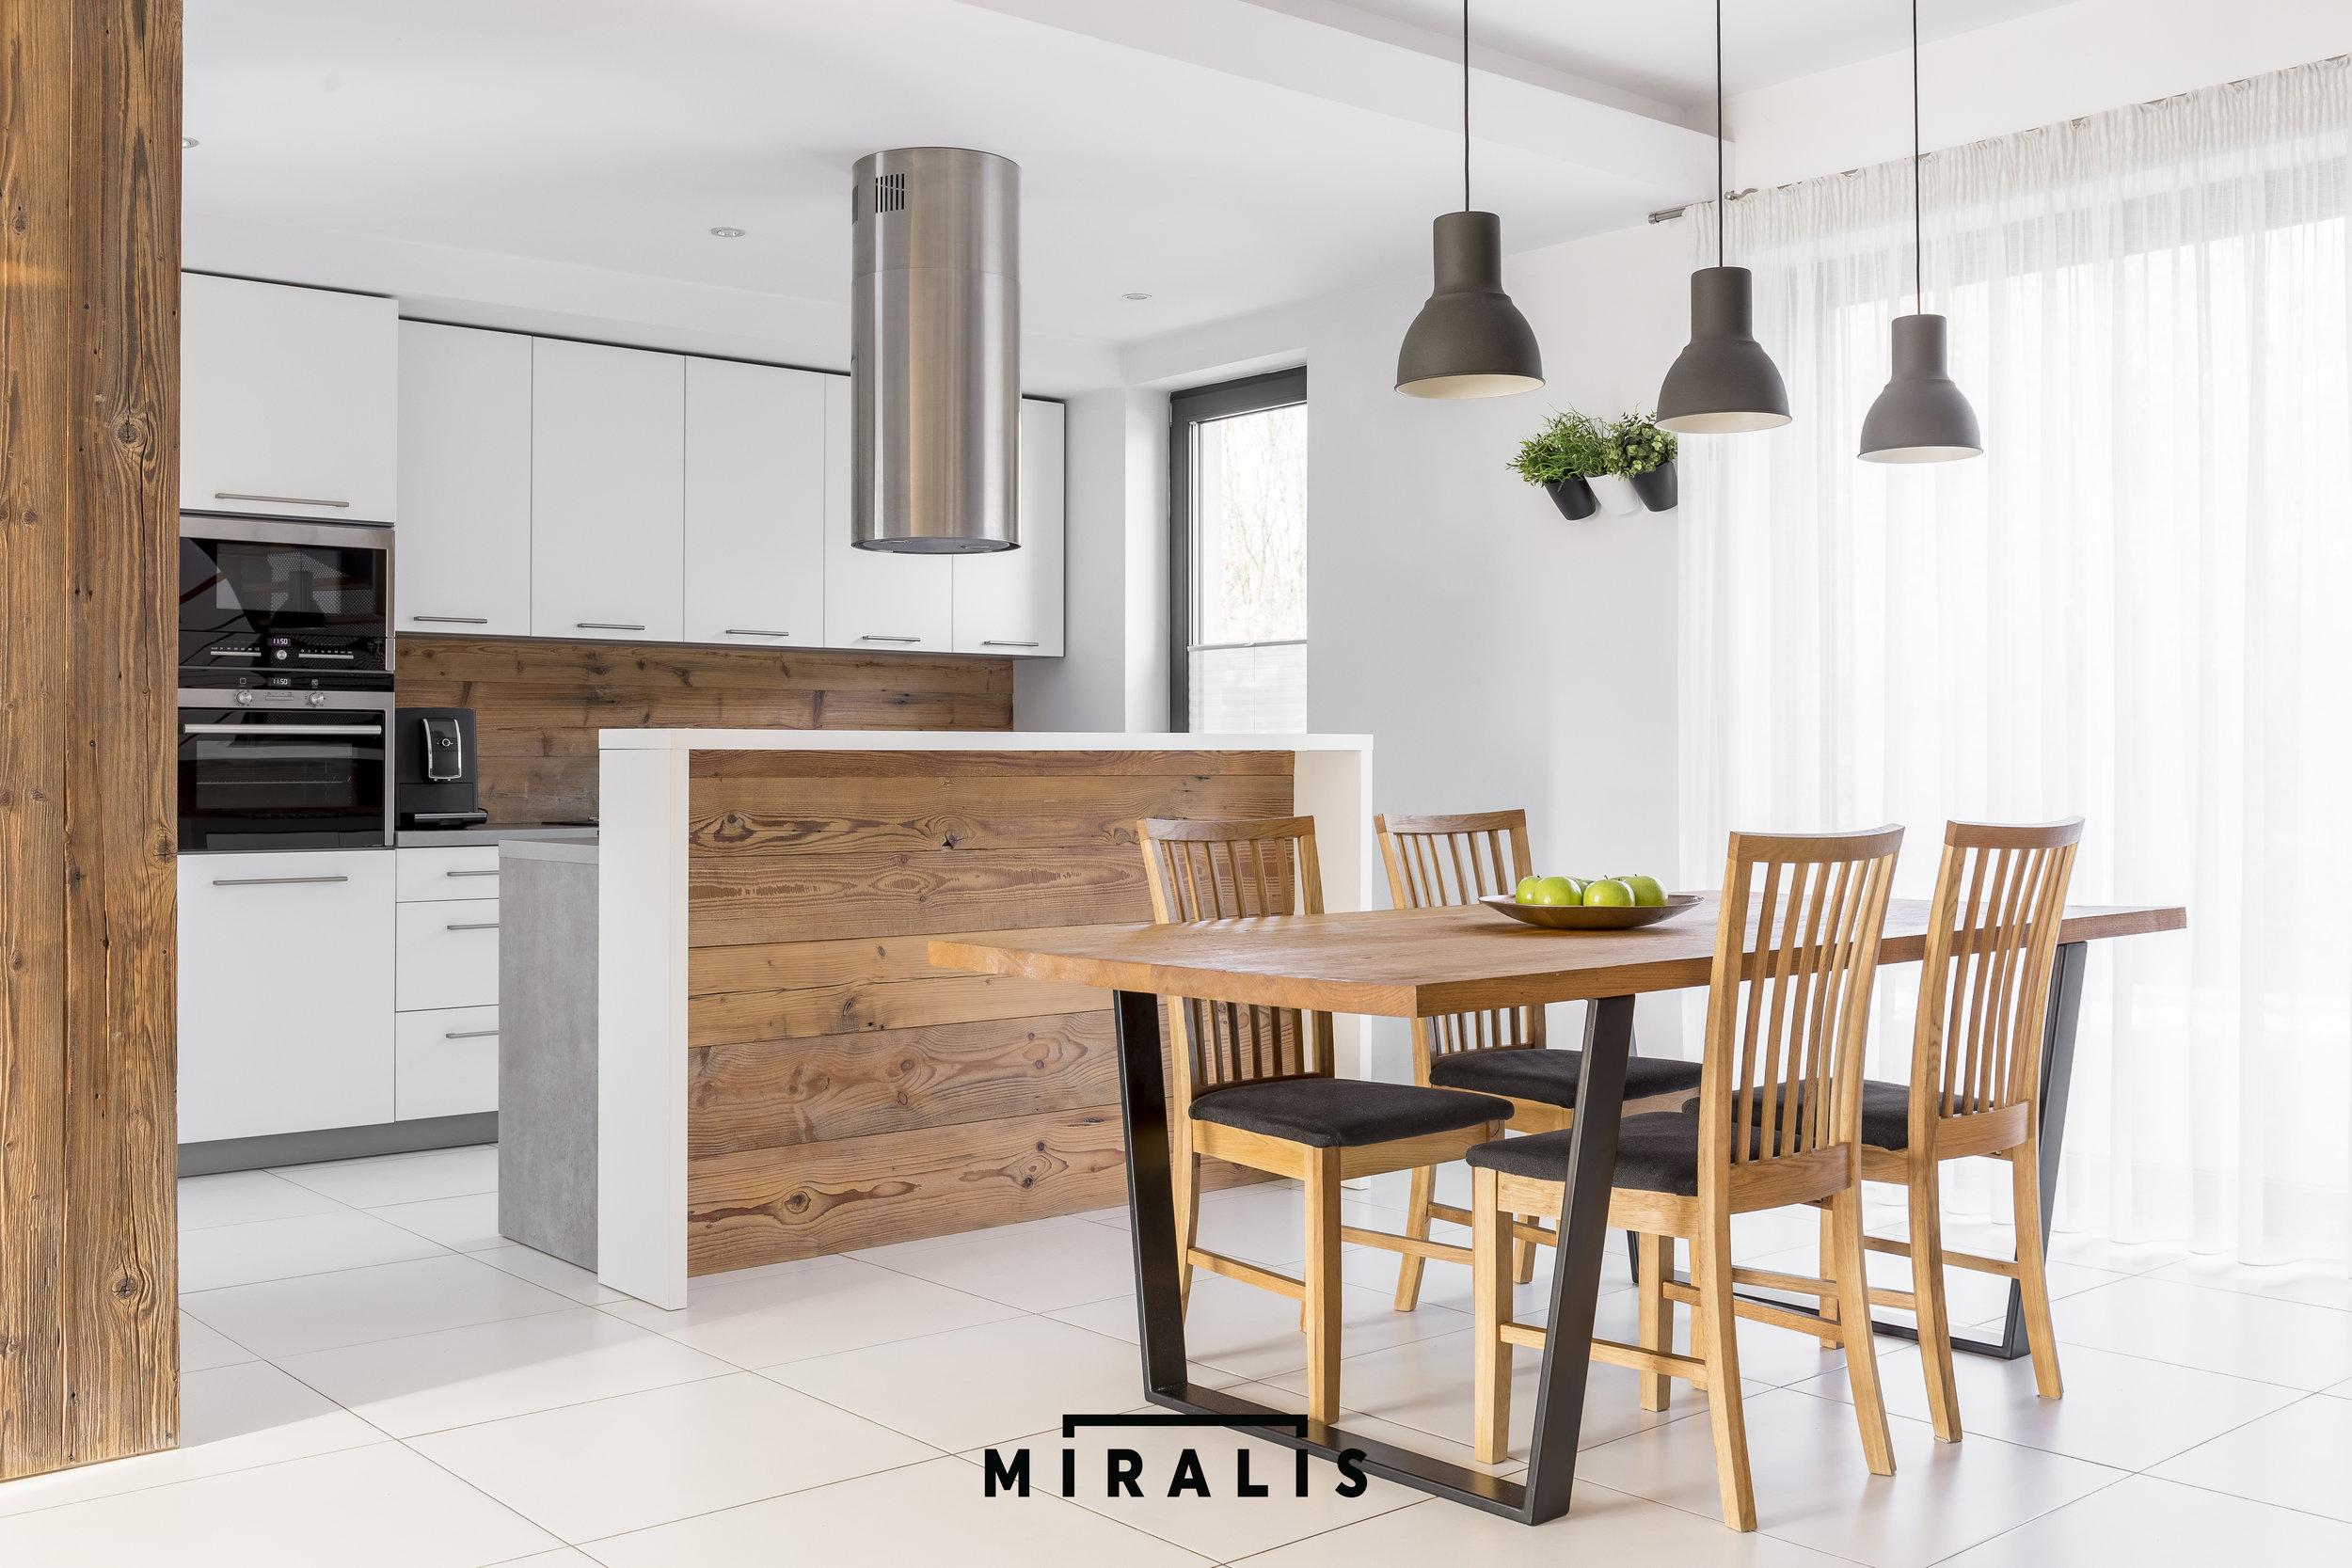 Miralis_15.jpg